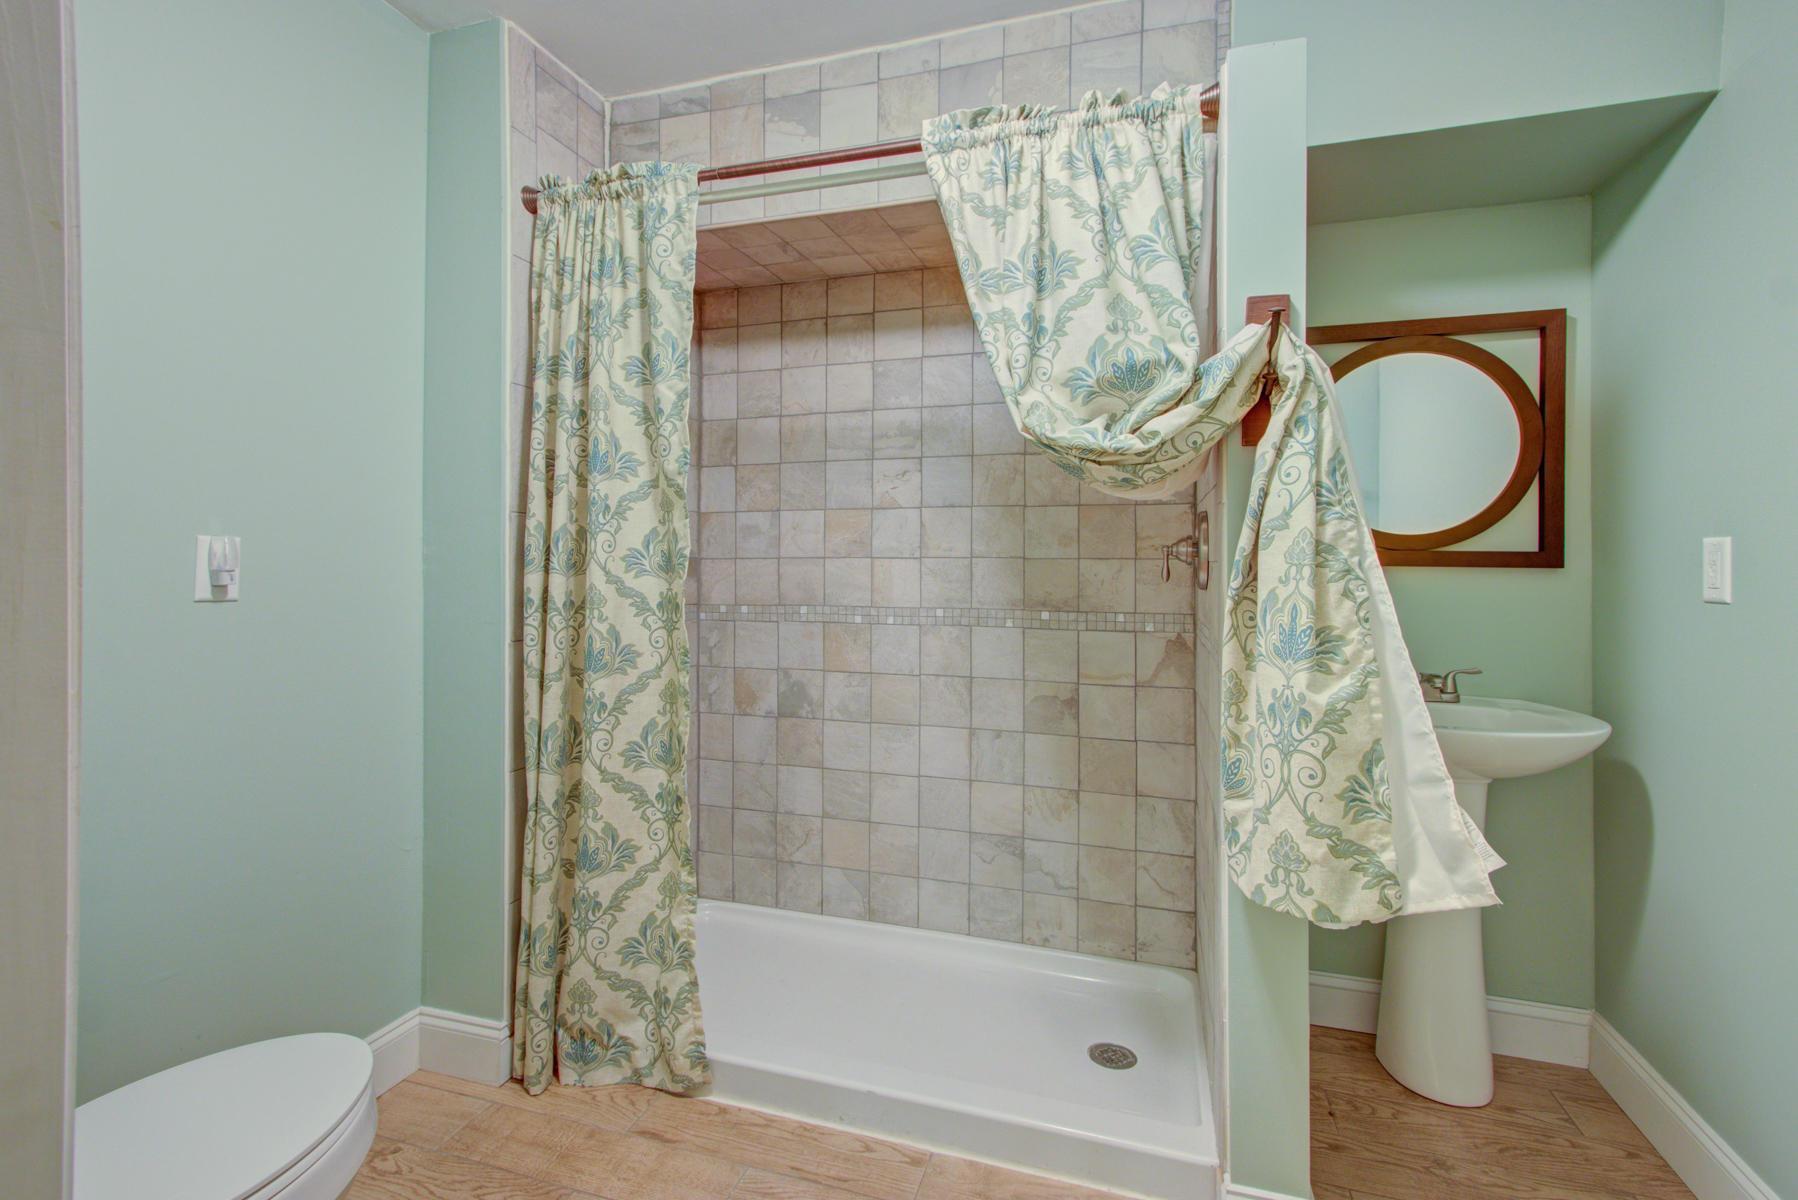 Cedar Grove Homes For Sale - 8733 Millerville, North Charleston, SC - 31